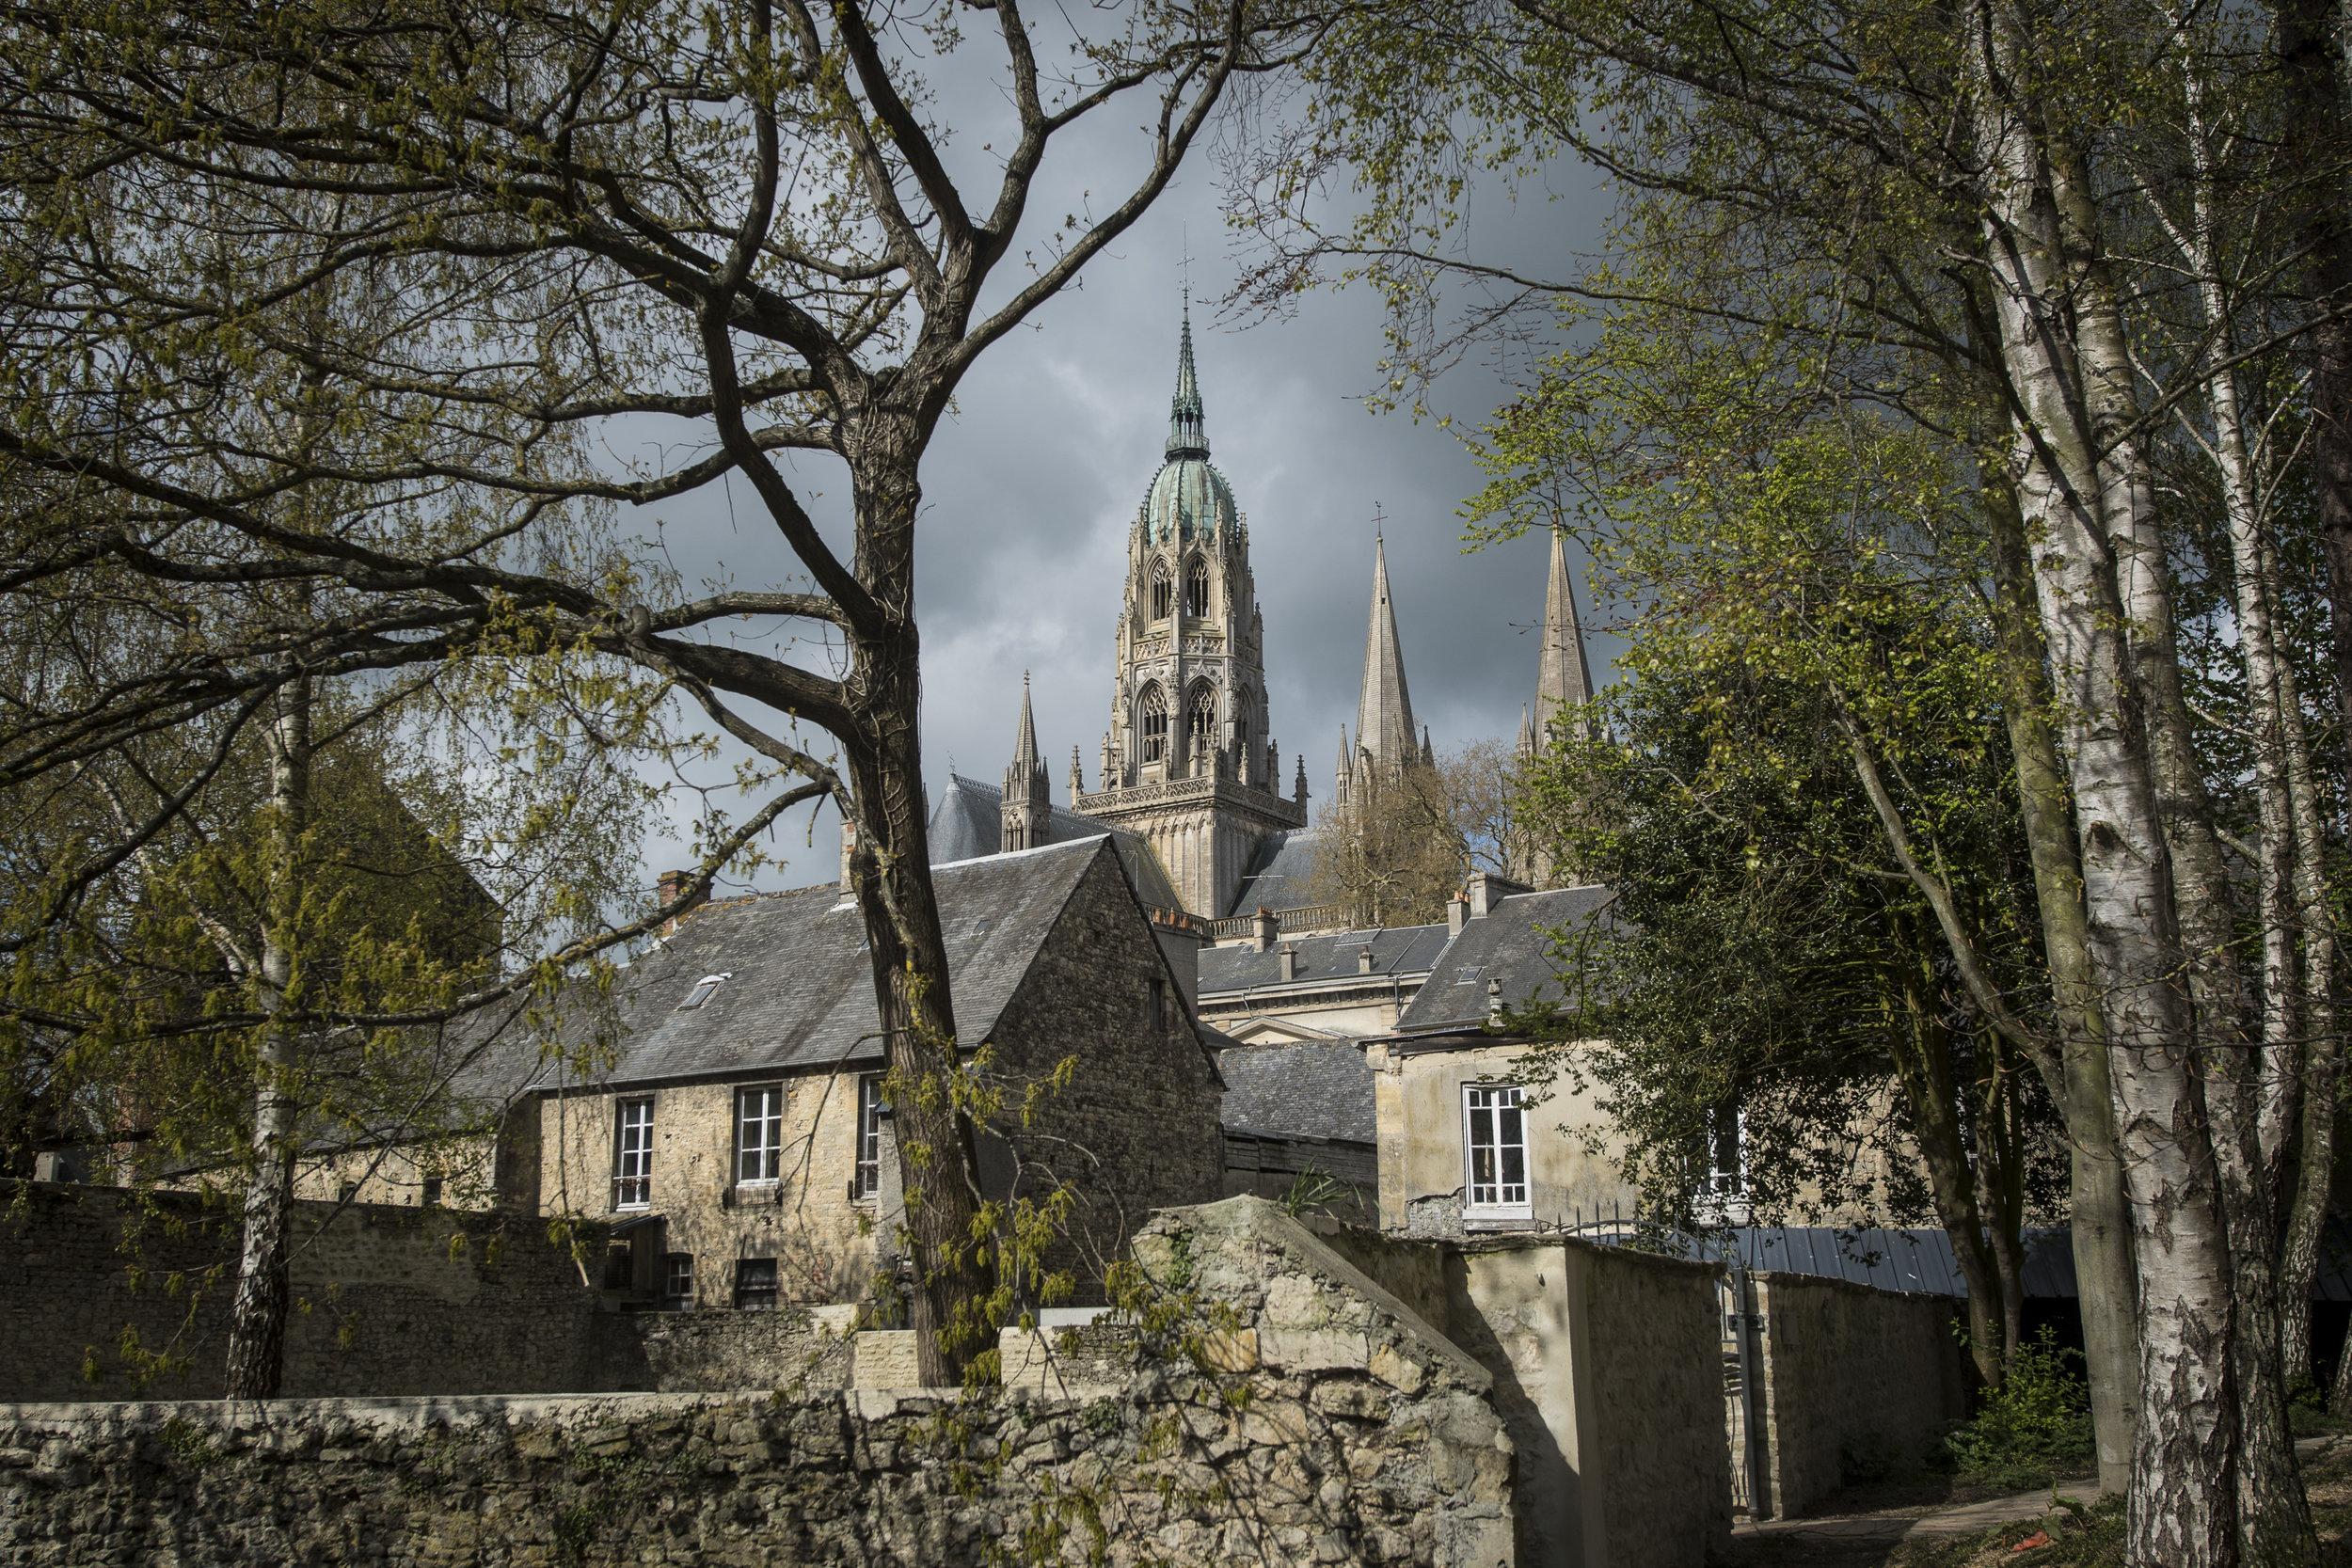 La Cathédrale de Bayeu - Bayeu  PHOTOGRAPHY: ALEXANDER J.E. BRADLEY • NIKON D500 • AF-S NIKKOR 14-24mm Ƒ/2.8G ED @ 24MM • Ƒ/8 • 1/320 • ISO 50